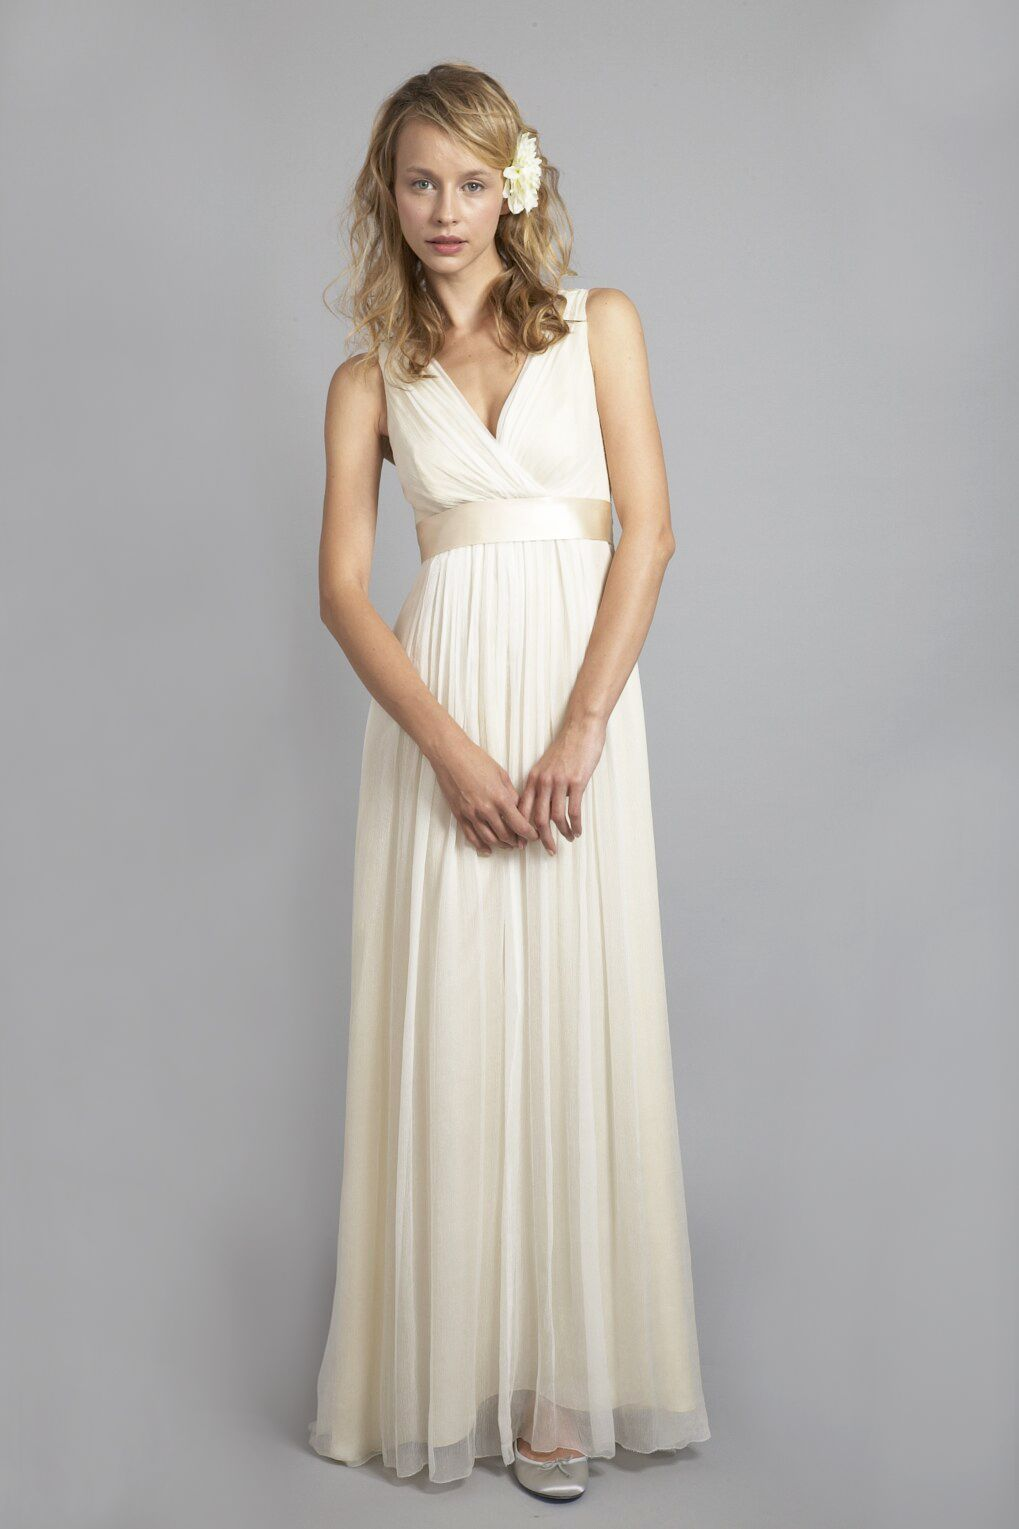 Du6556 vneck elegant silk chiffon shift dress wedding